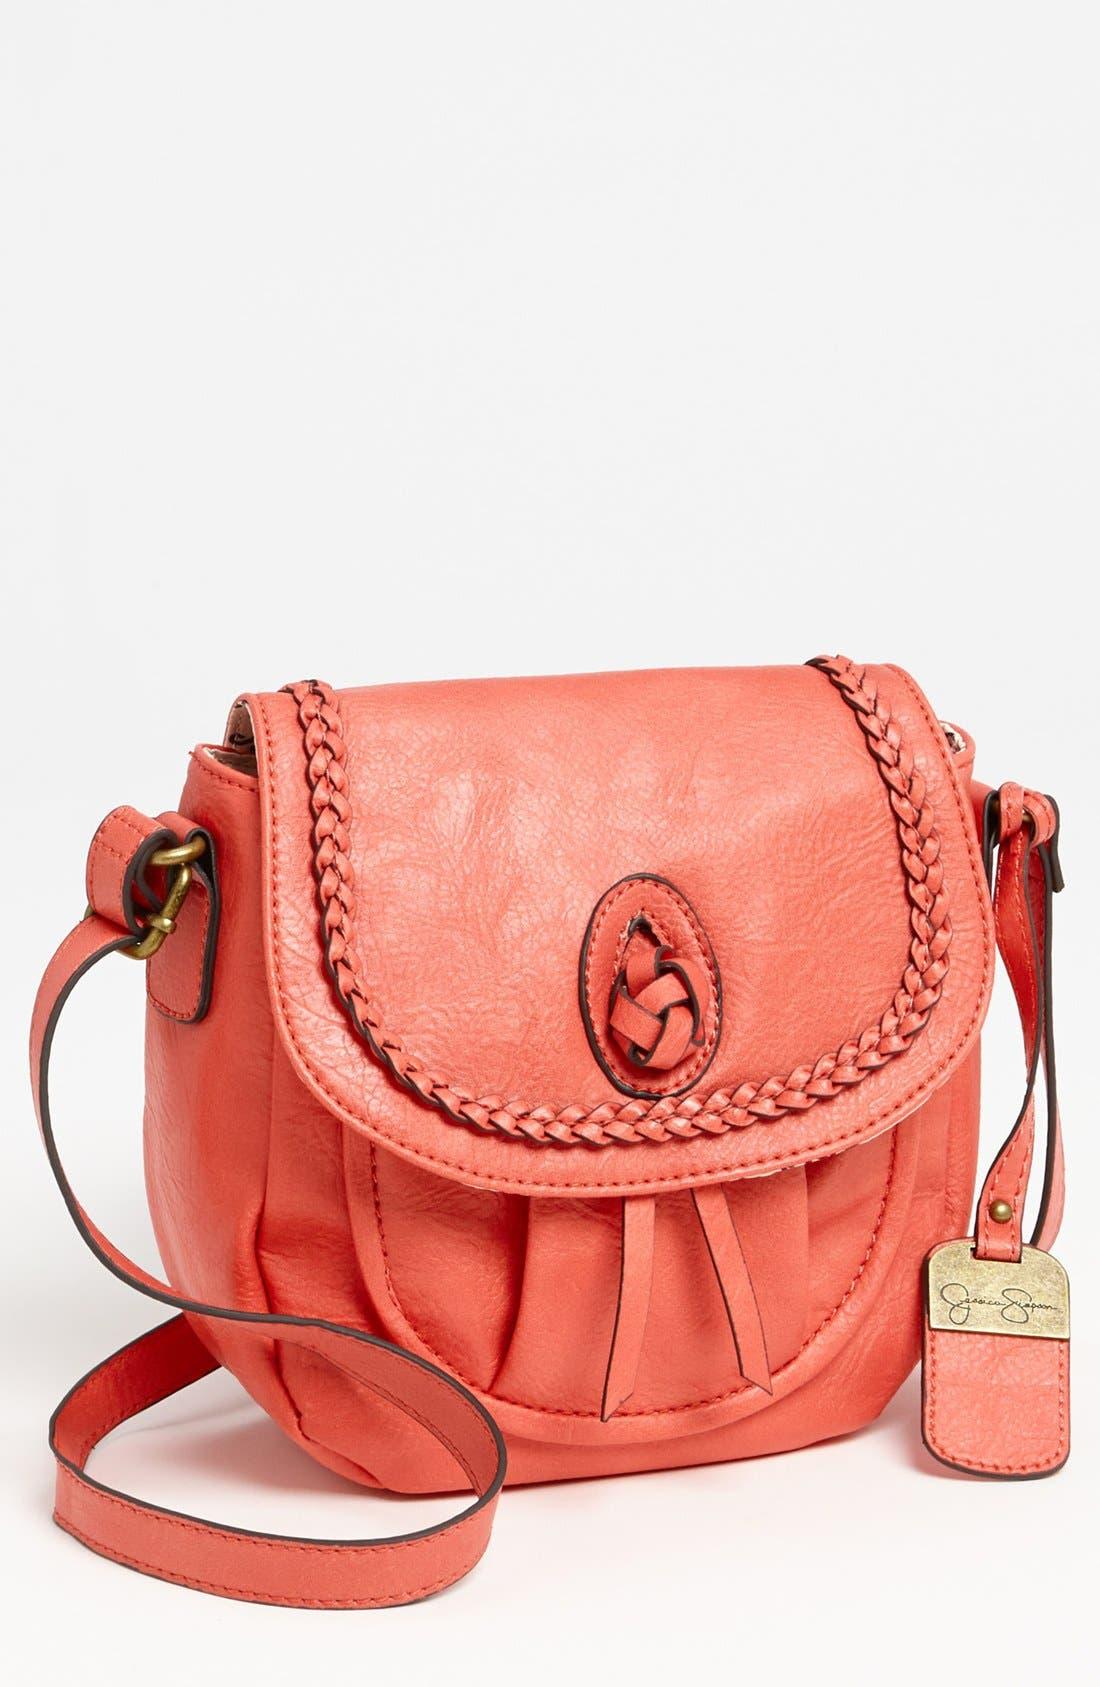 Alternate Image 1 Selected - Jessica Simpson 'Emma' Faux Leather Crossbody Bag